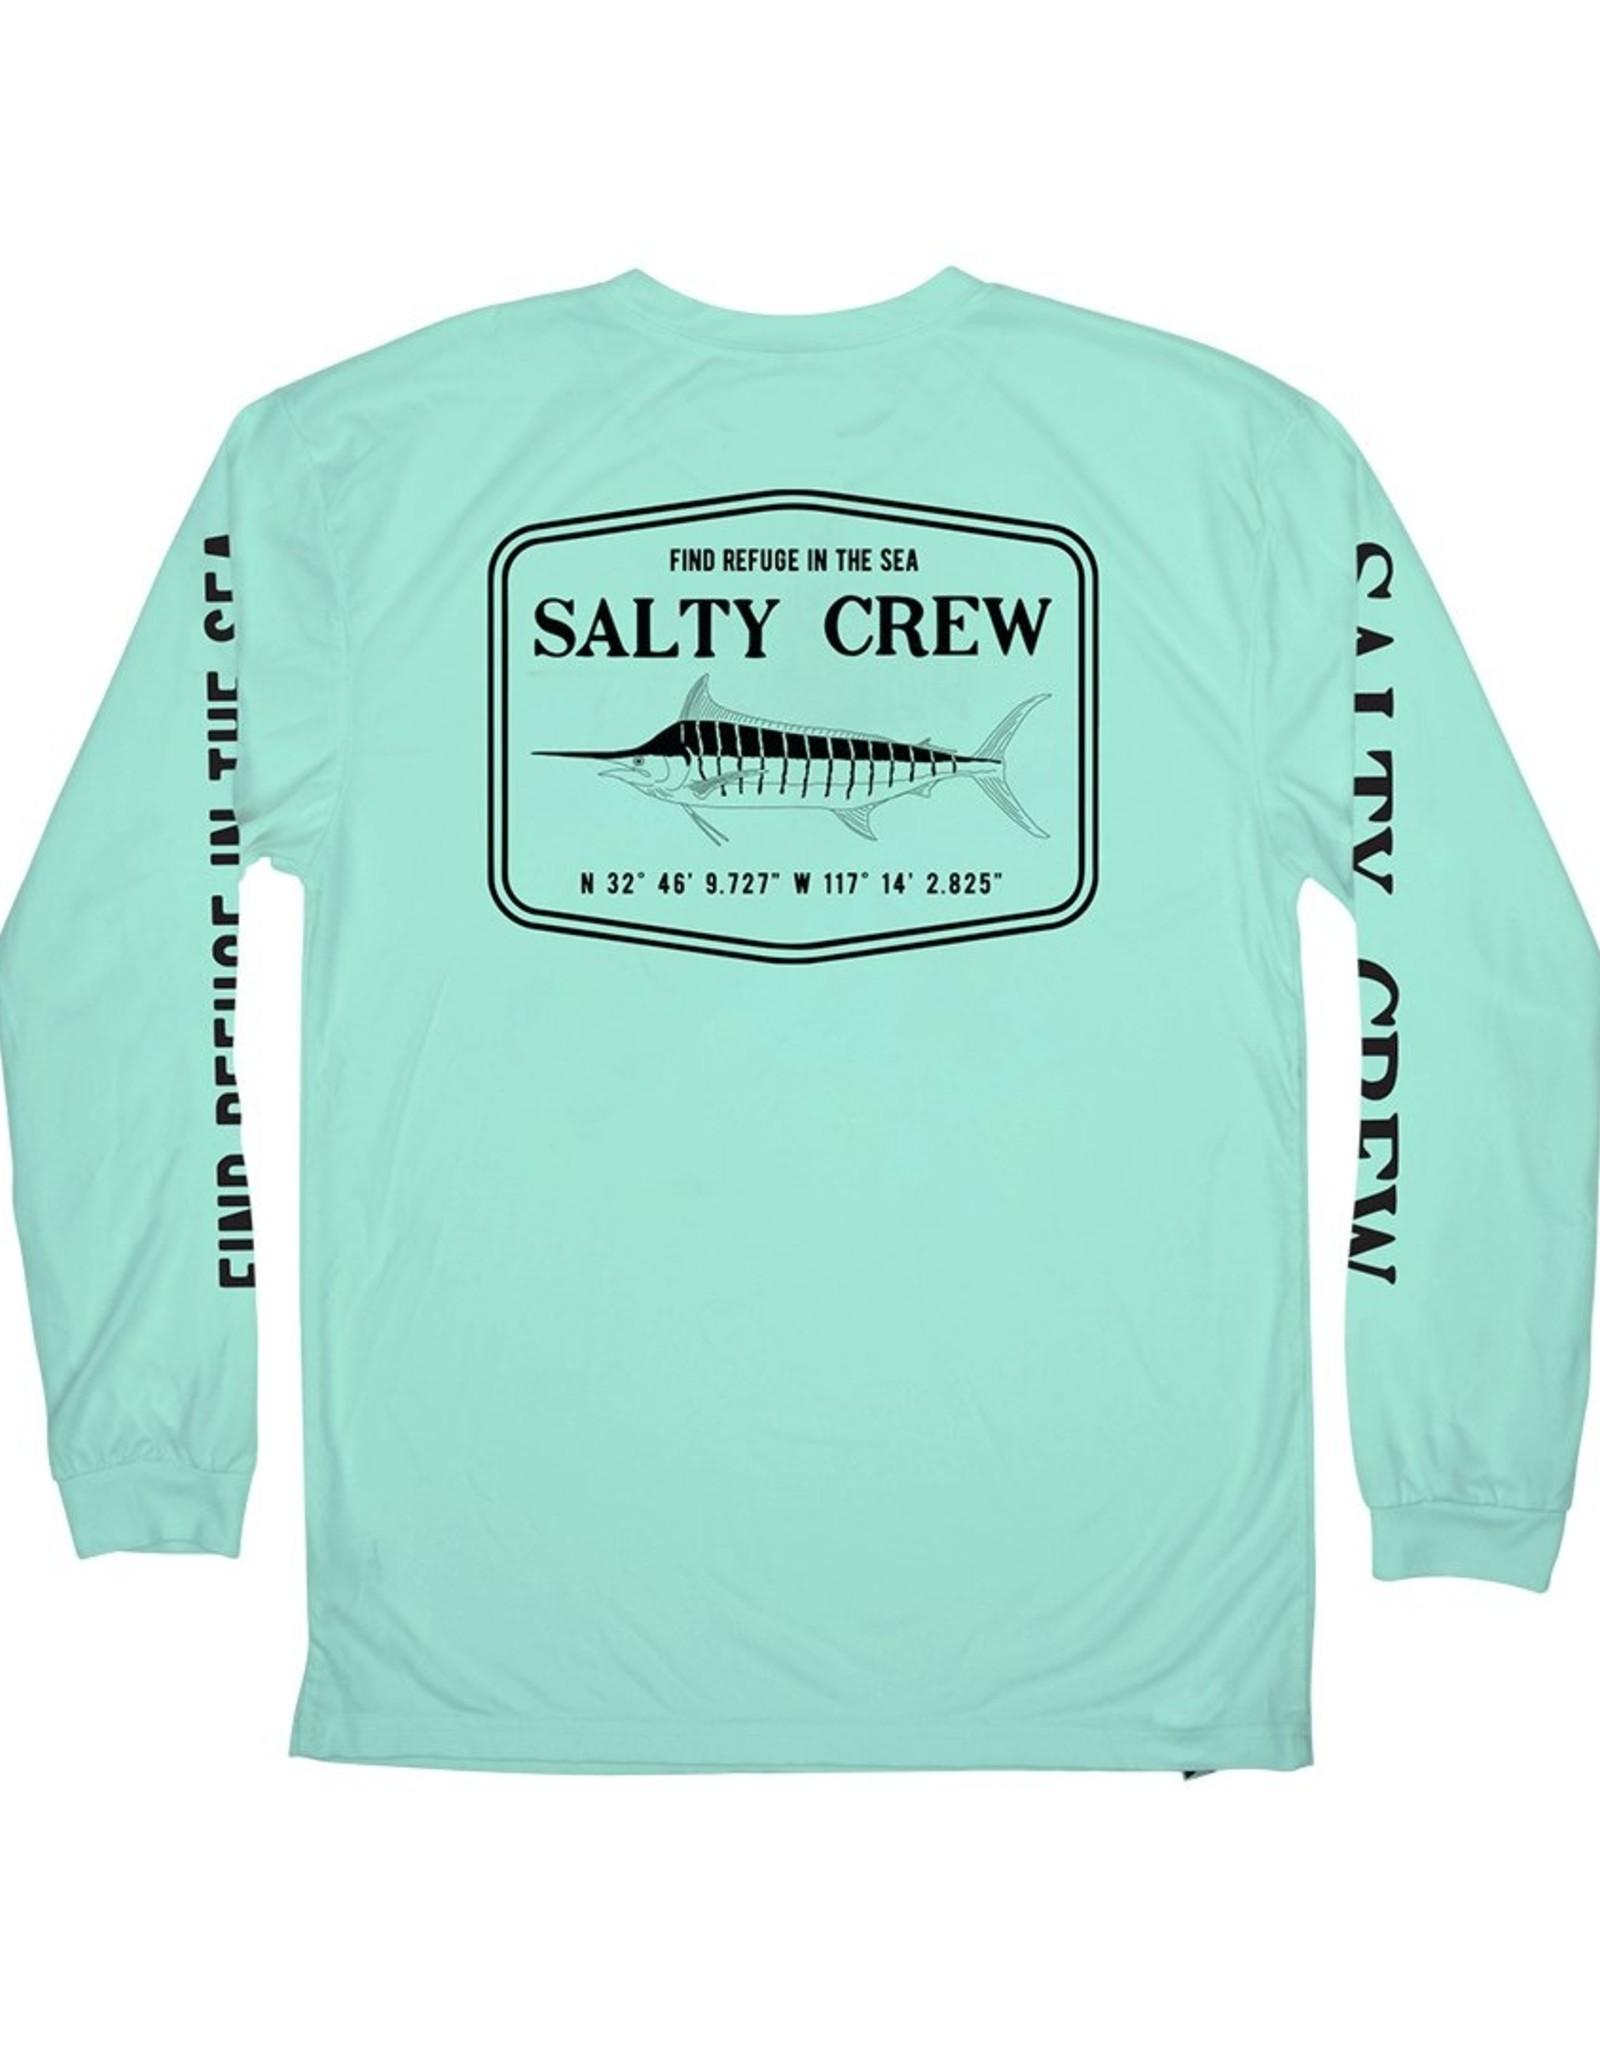 Salty Crew Stealth Rashguard